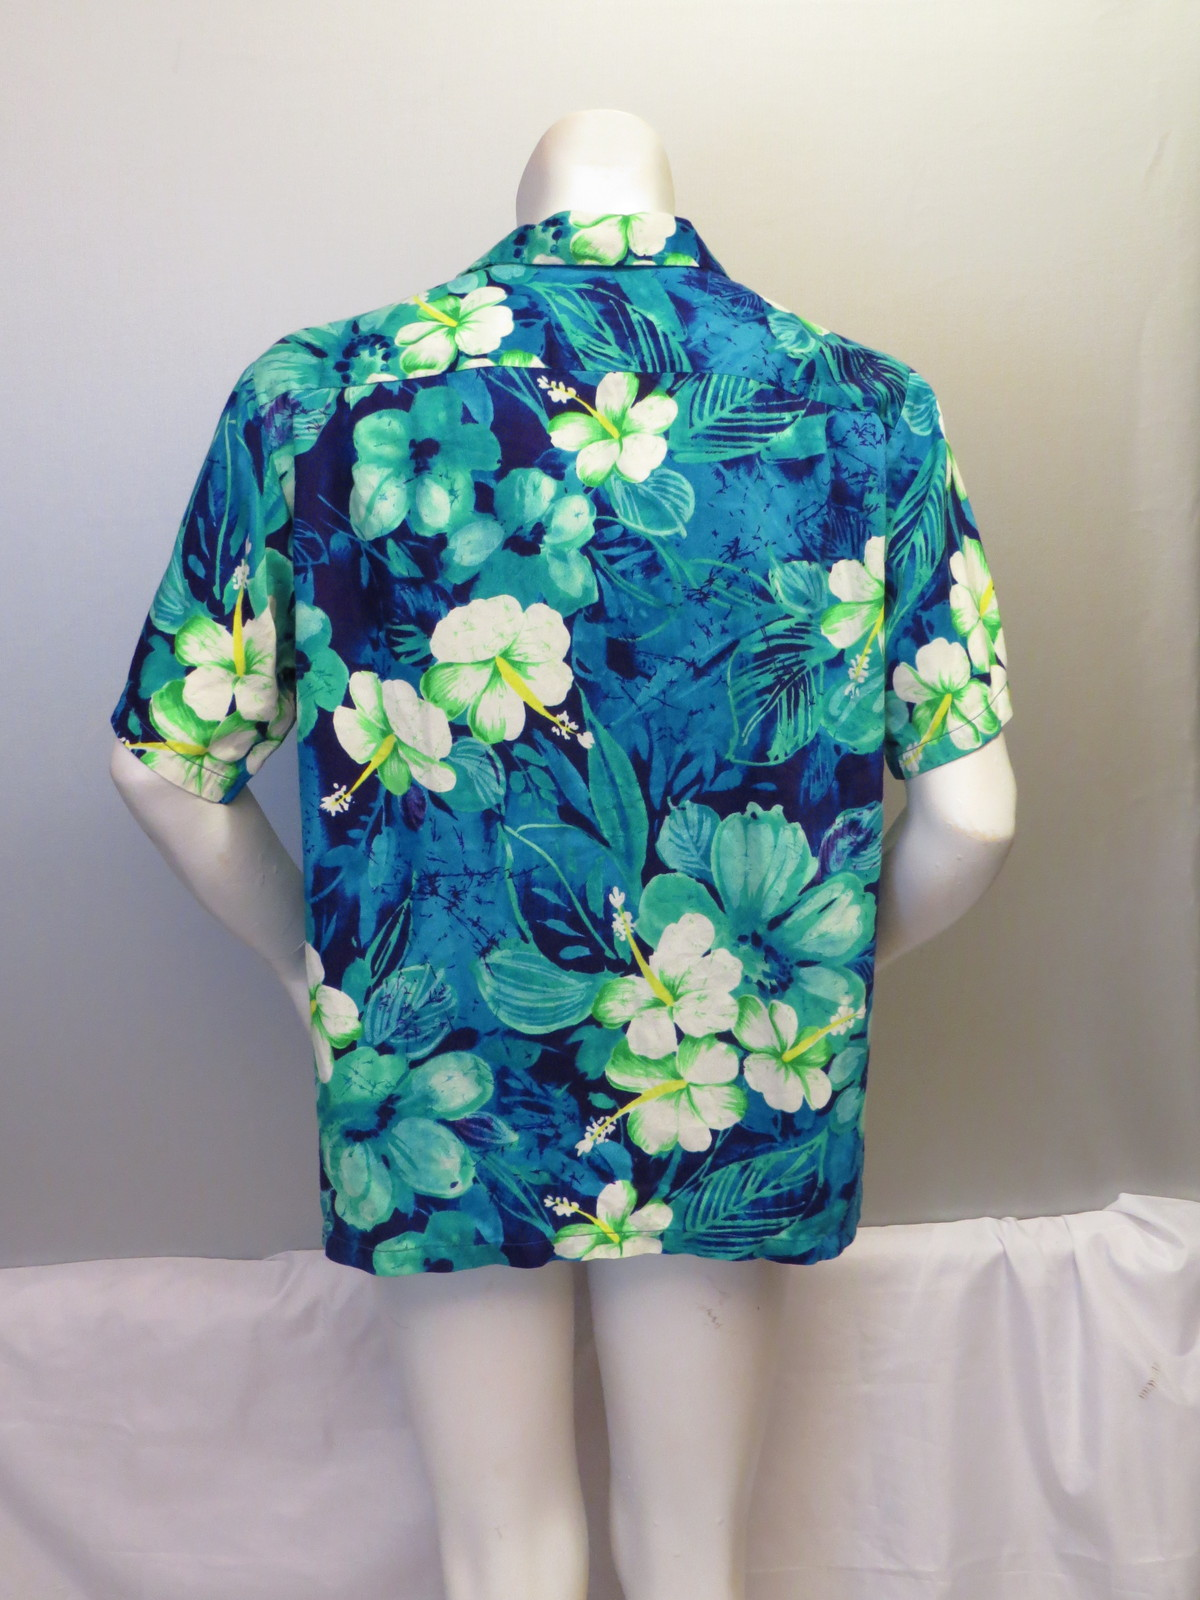 Vintage Hawaiian Aloha Shirt - TC Hawaii Vibrant Floral Pattern - Men's XL Mnr6FJ